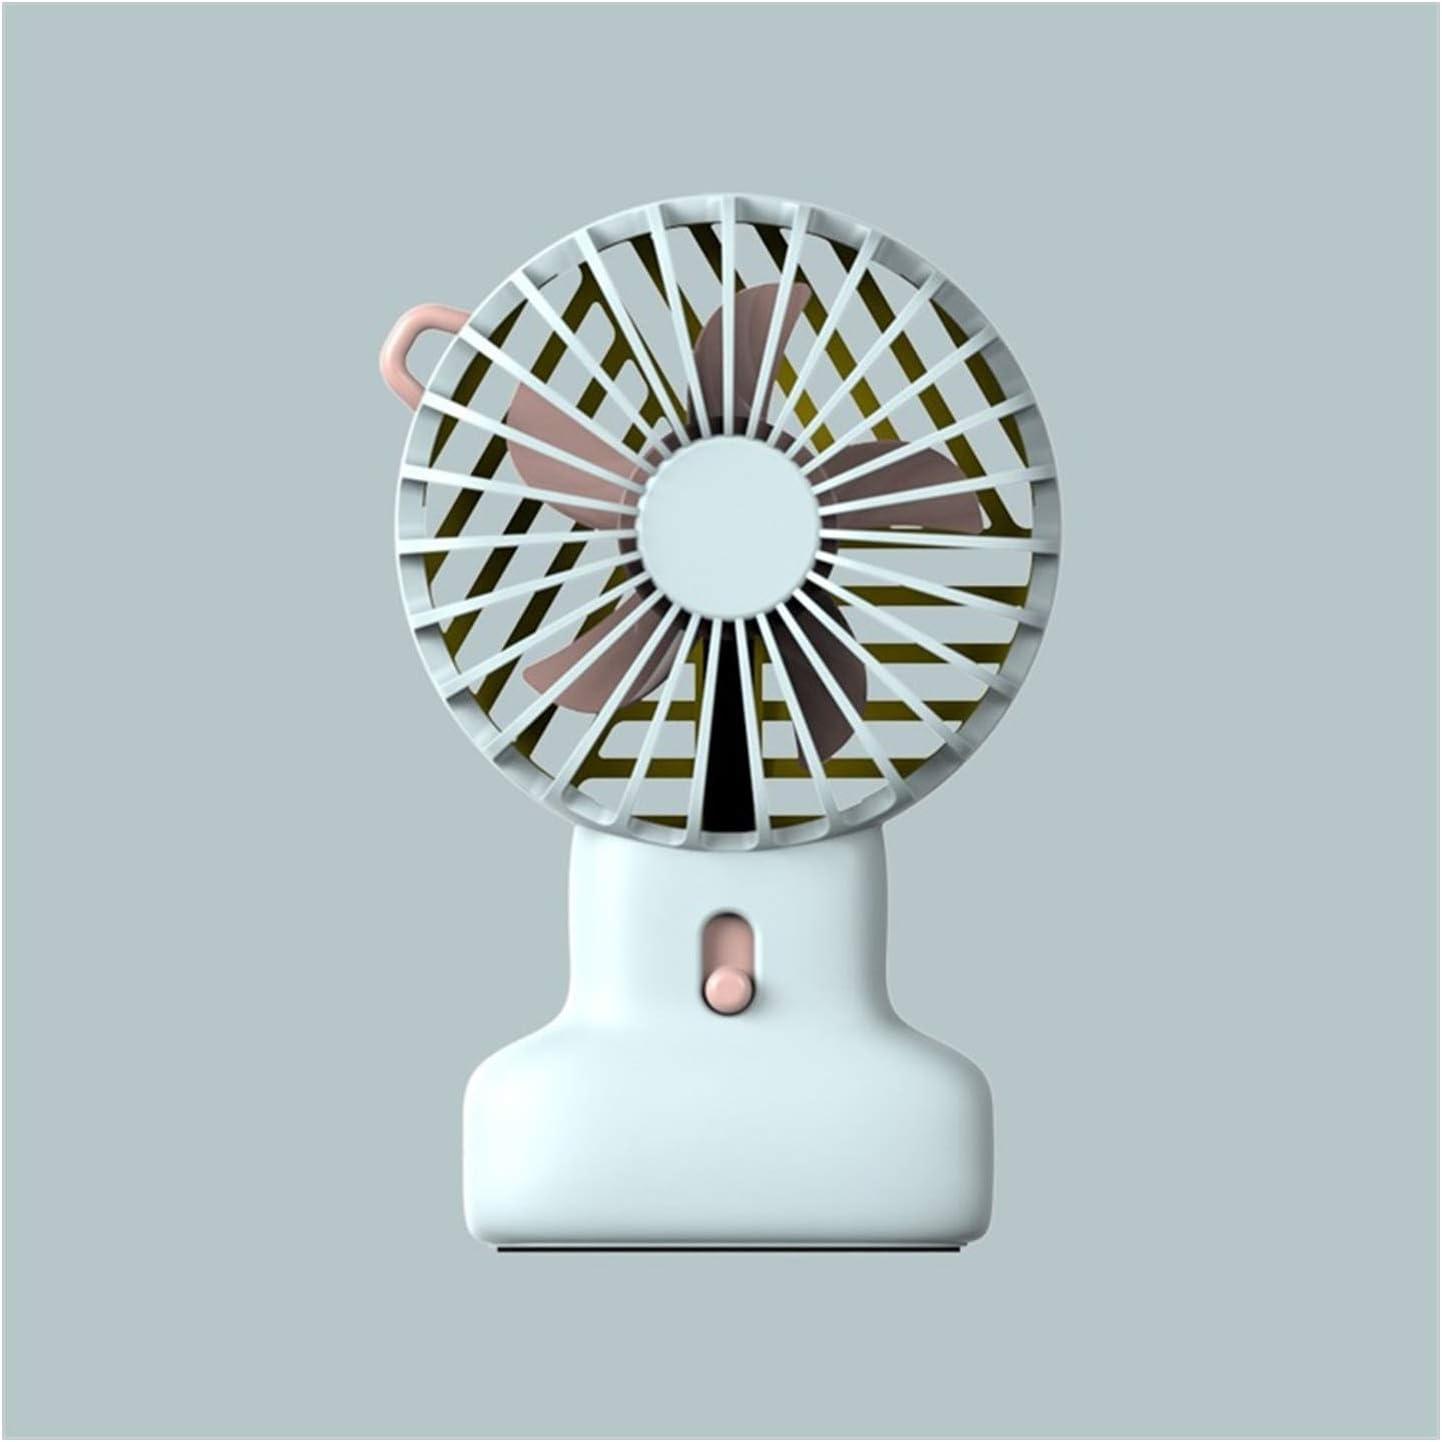 XIAOF-FEN Mini Portable Round Fan USB Handheld Portable Electric Fan Outdoor Cooling Fans USB Fan Color : 05